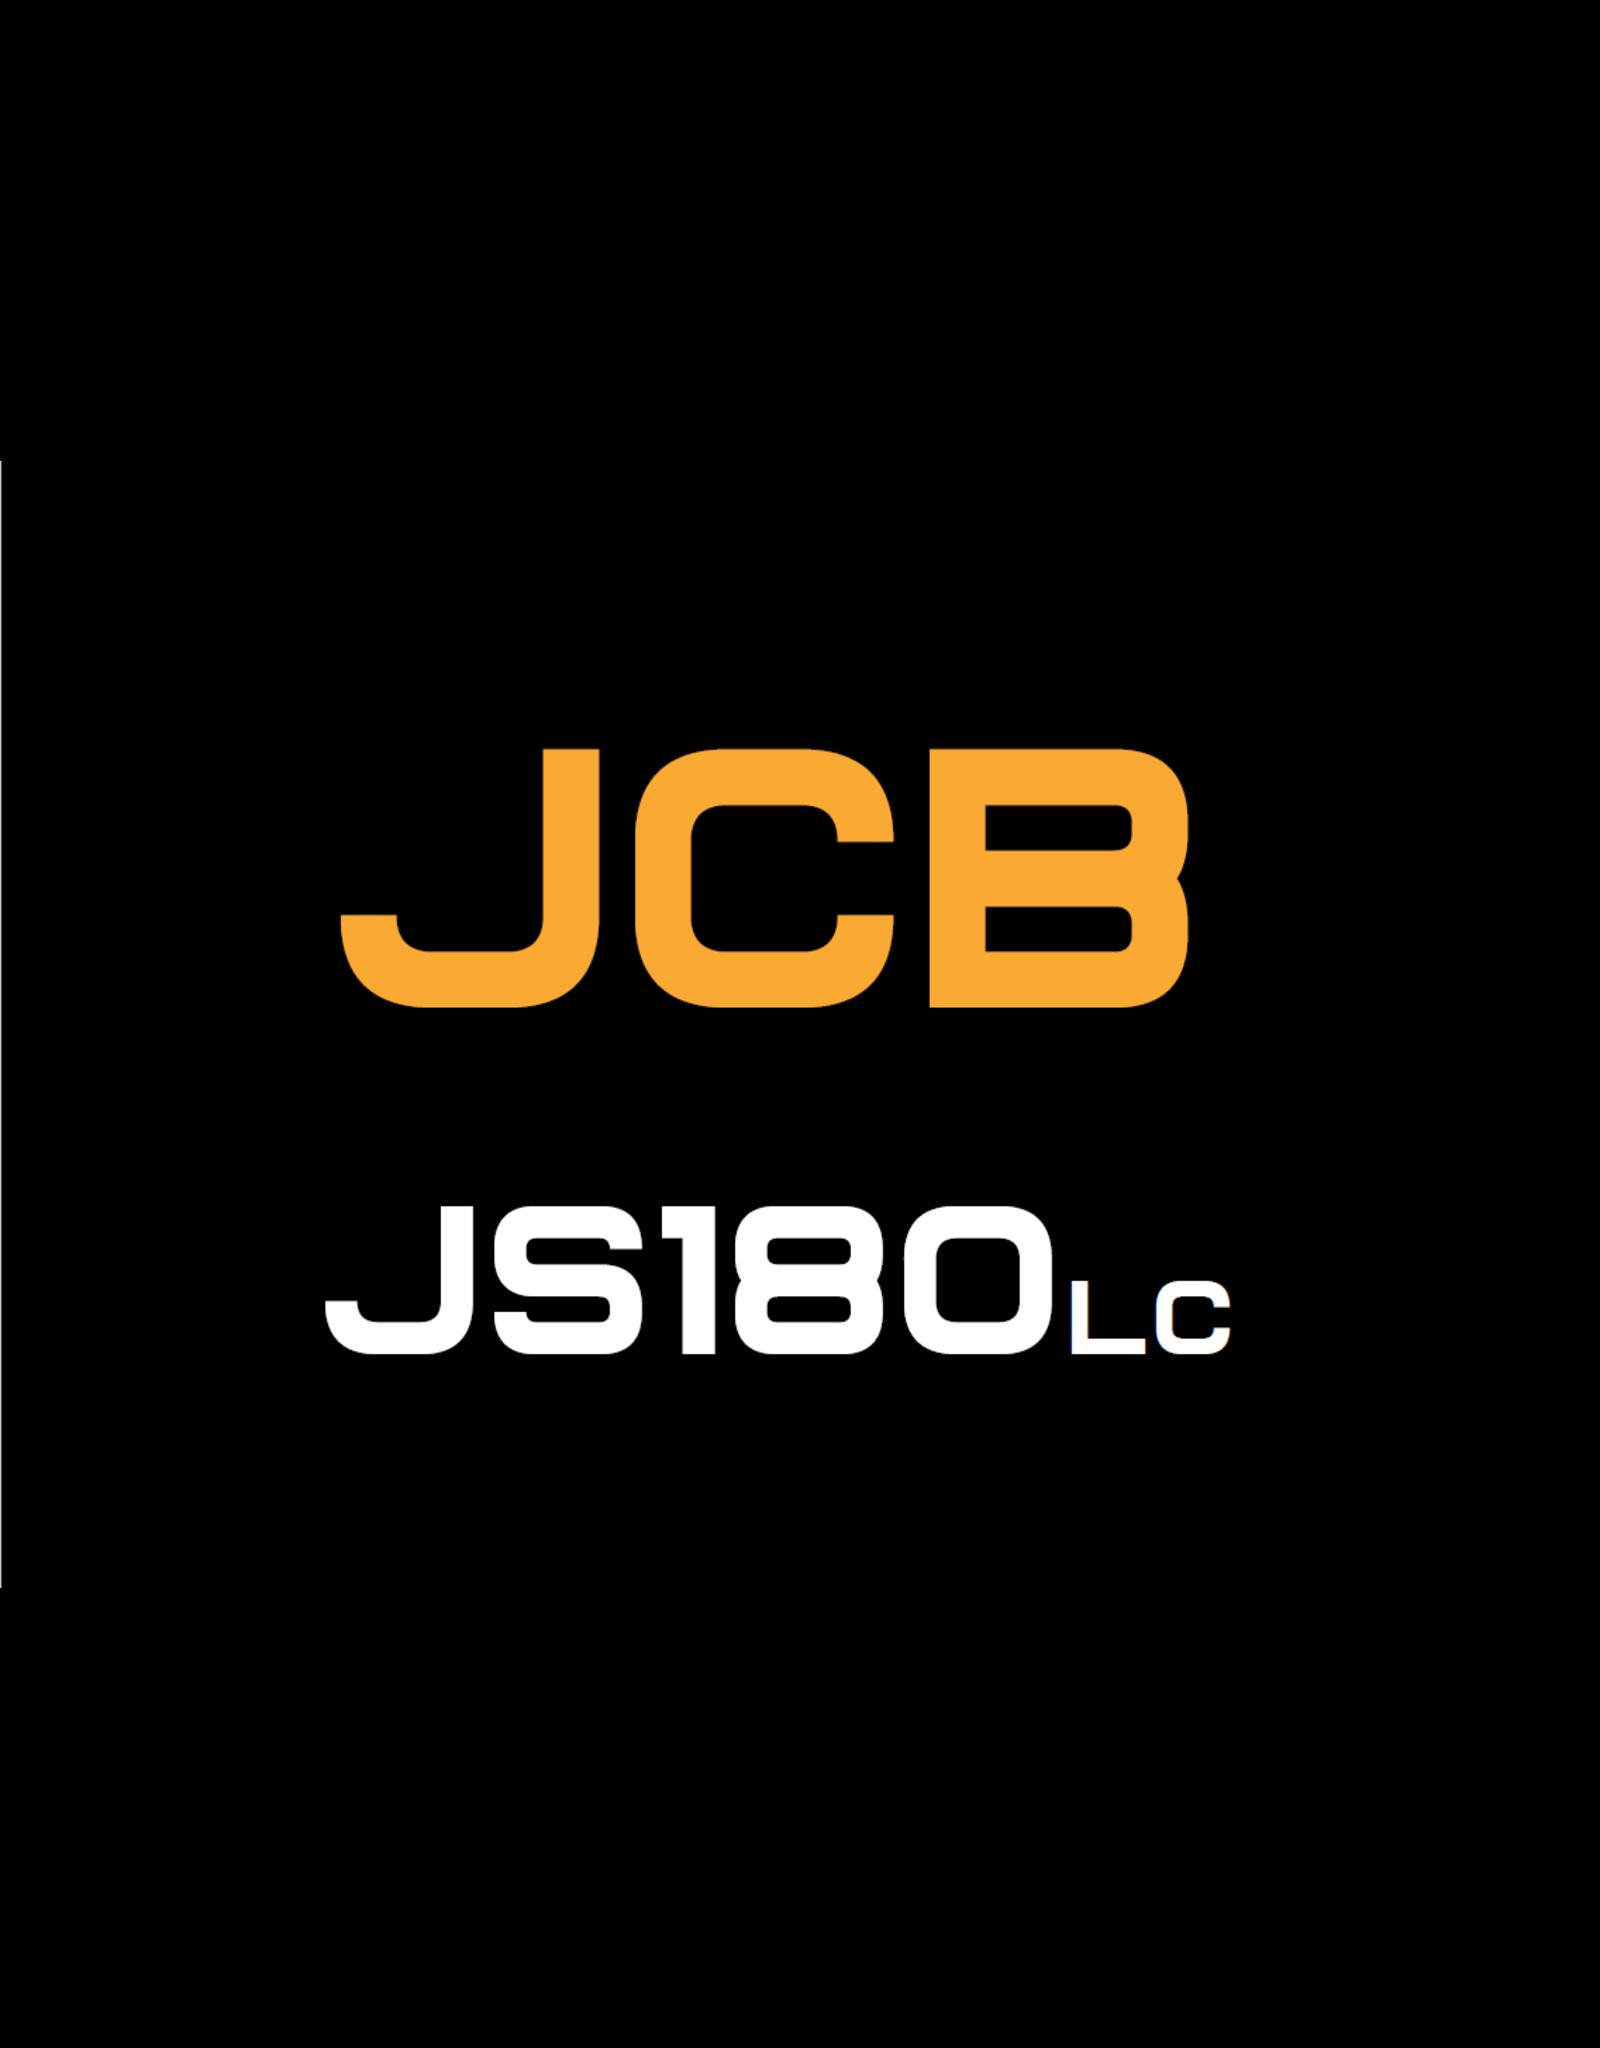 Echle Hartstahl GmbH FOPS für JCB JS180LC